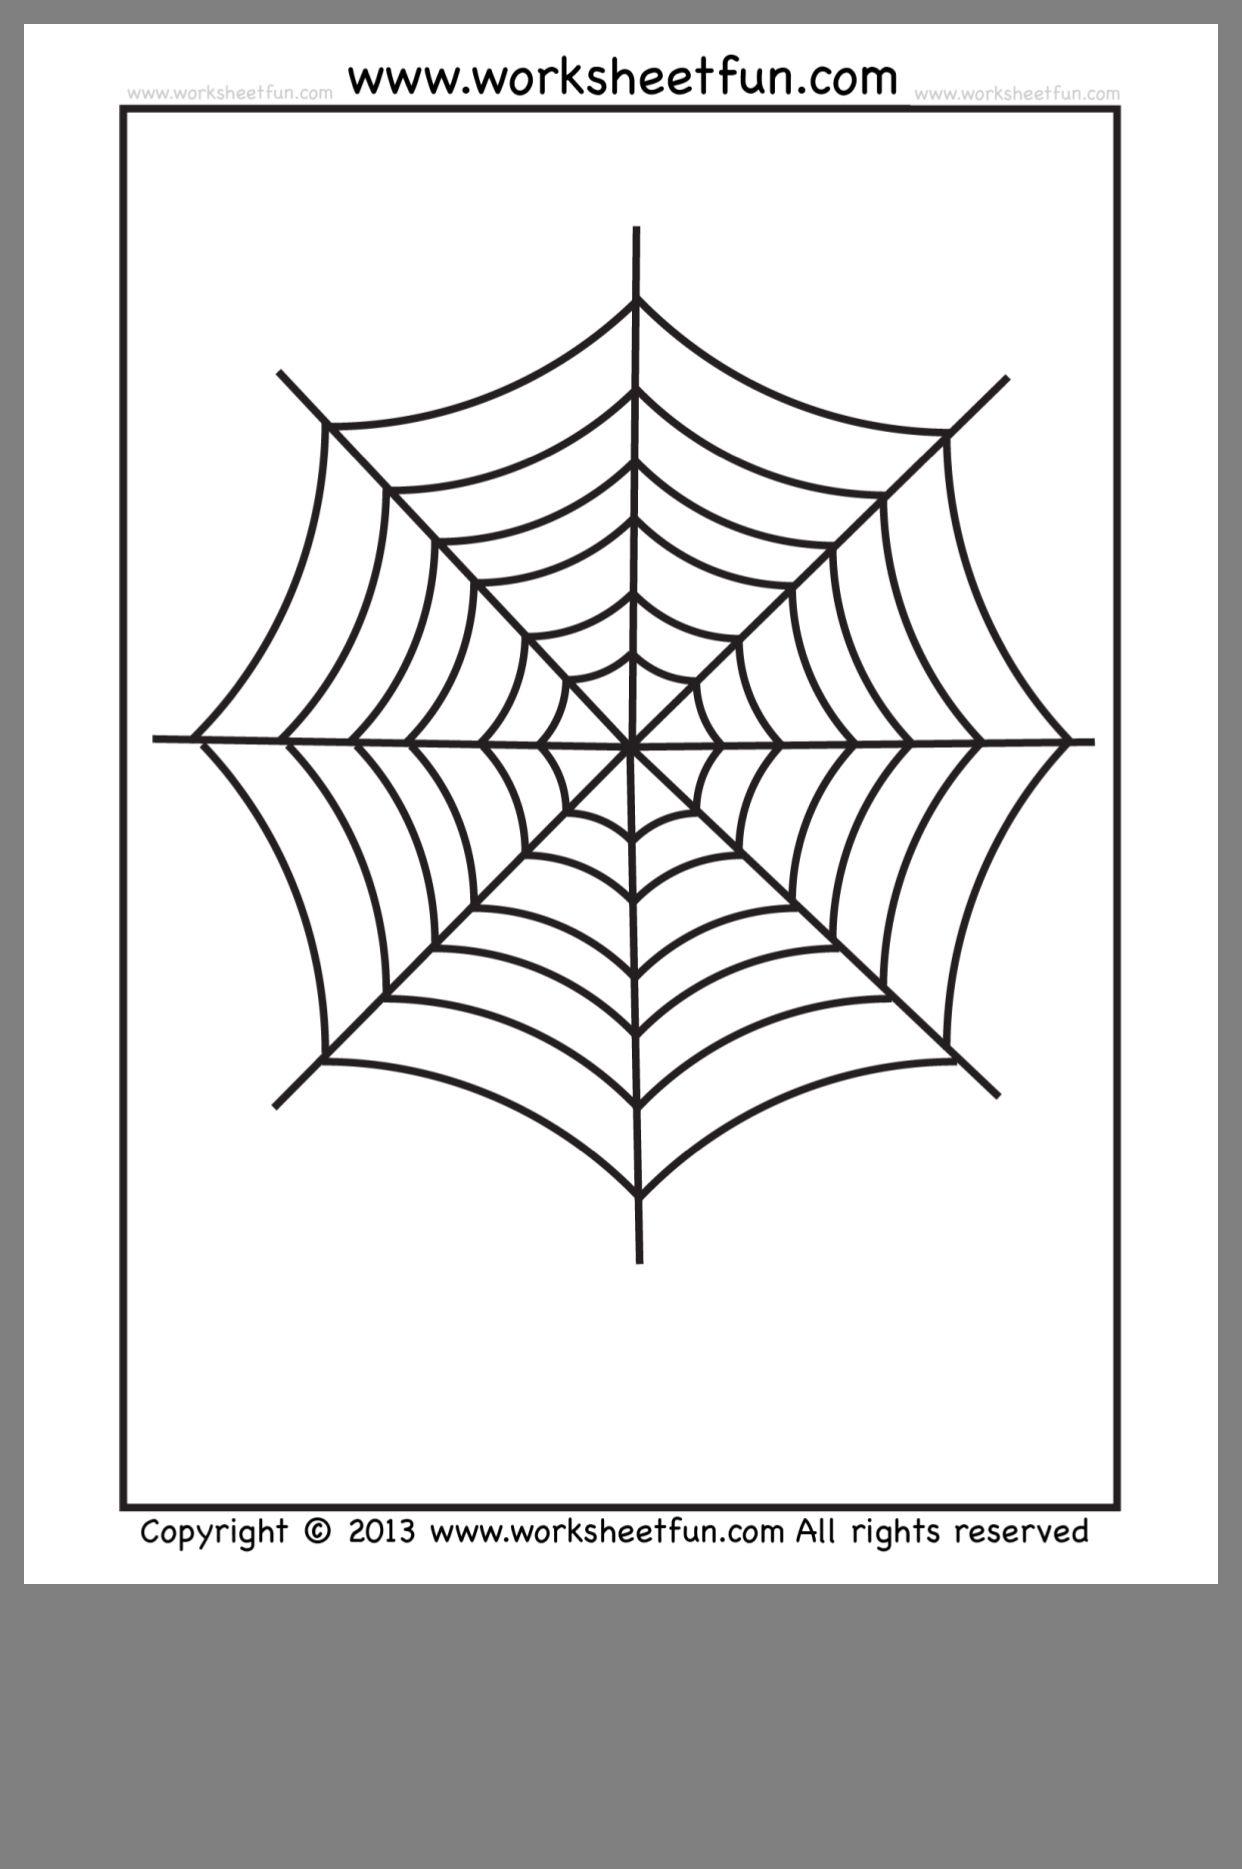 Pin By Christina Brawley On Preschool Fun Halloween Worksheets Free Halloween Worksheets Halloween Preschool [ 1869 x 1242 Pixel ]